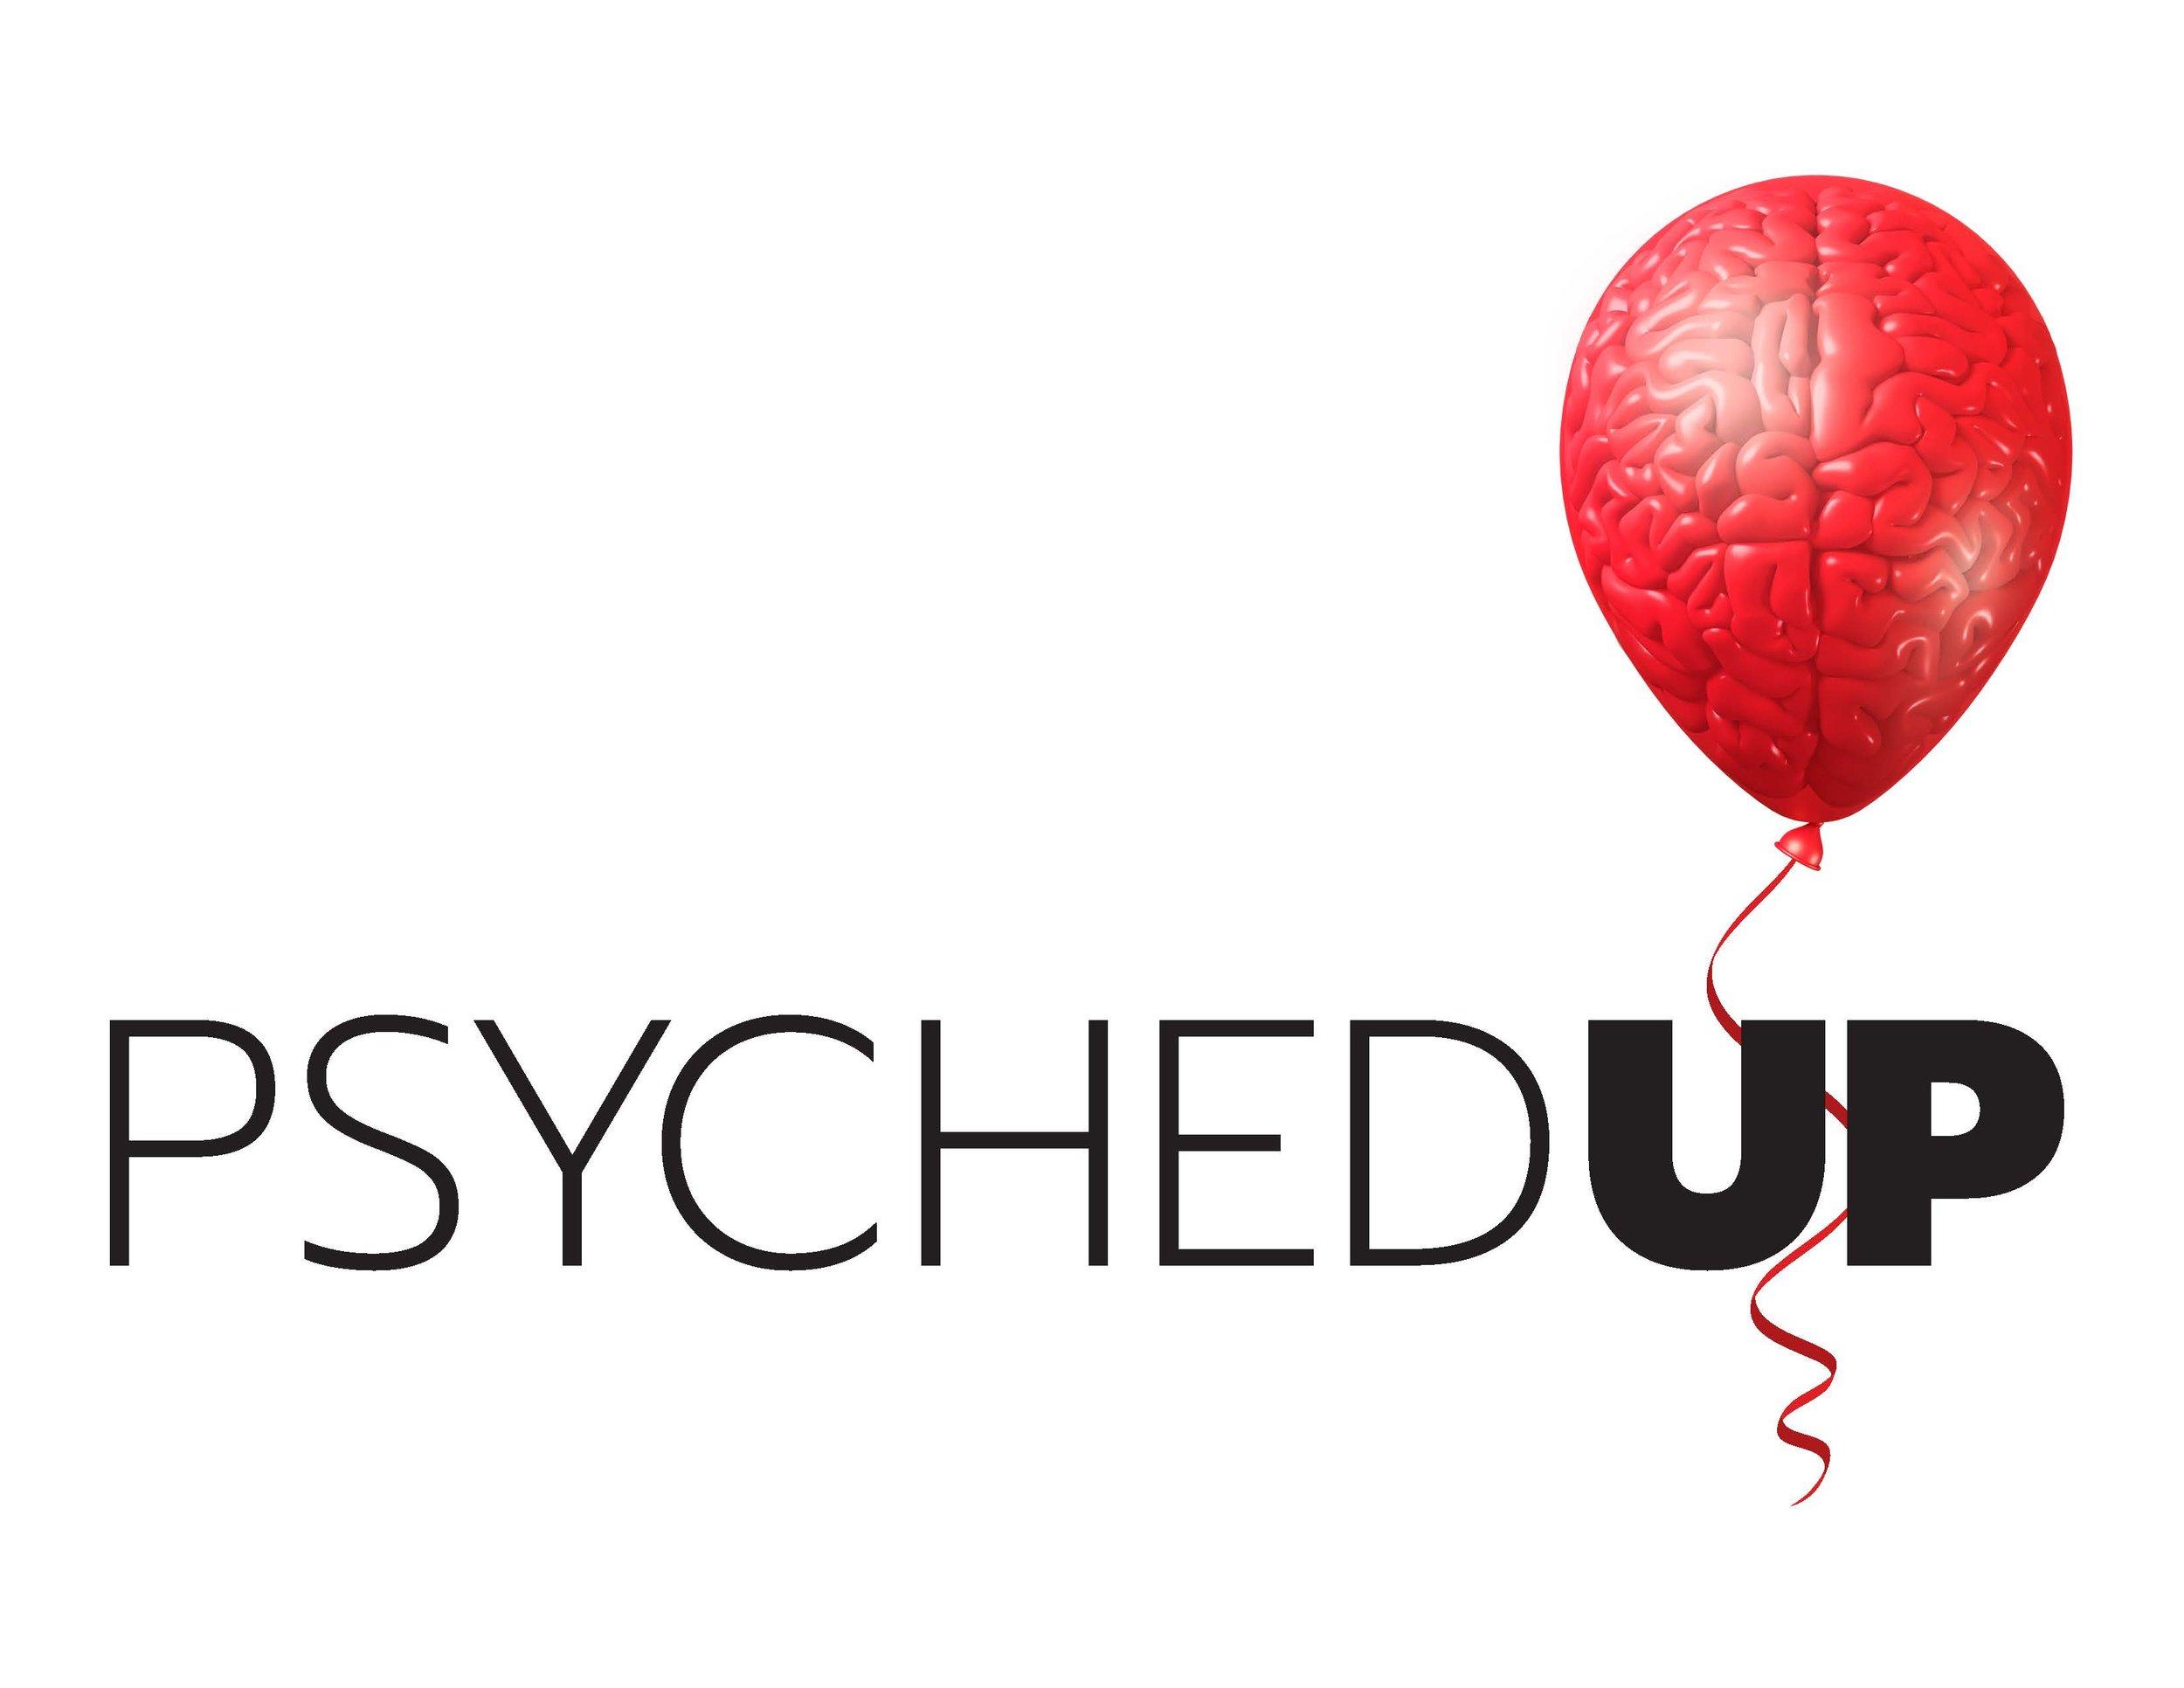 psychedup logo - jpeg.jpg